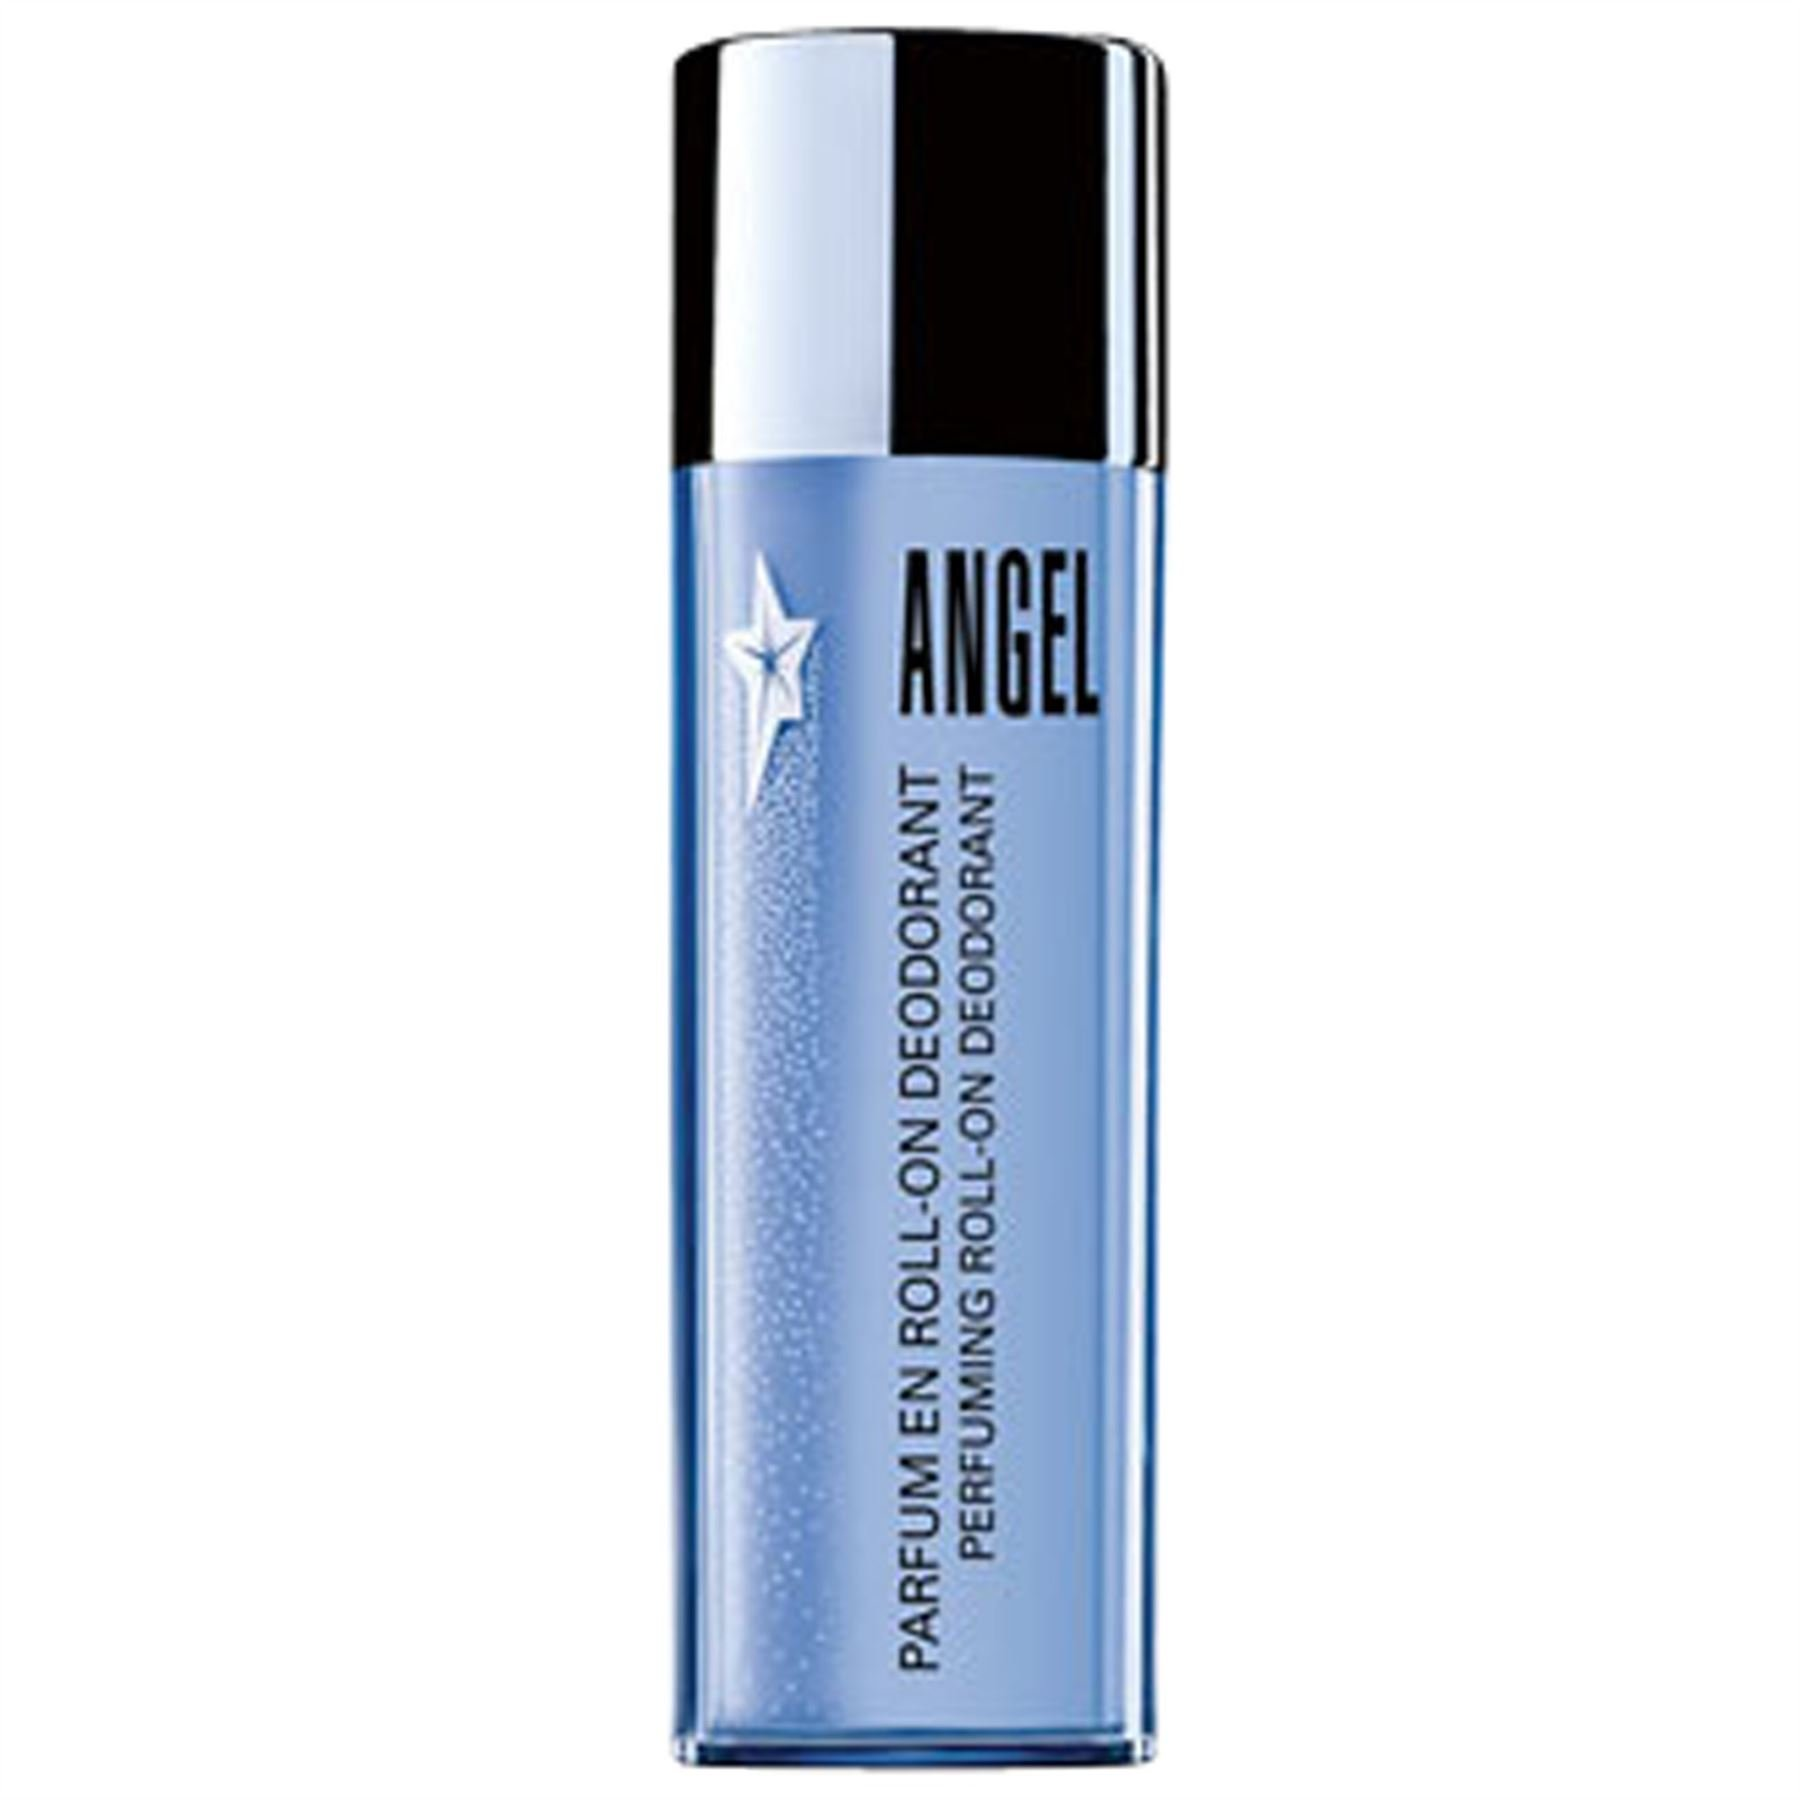 Thierry Mugler Angel Perfuming Deodorant Roll On 50ml - Pack of 2